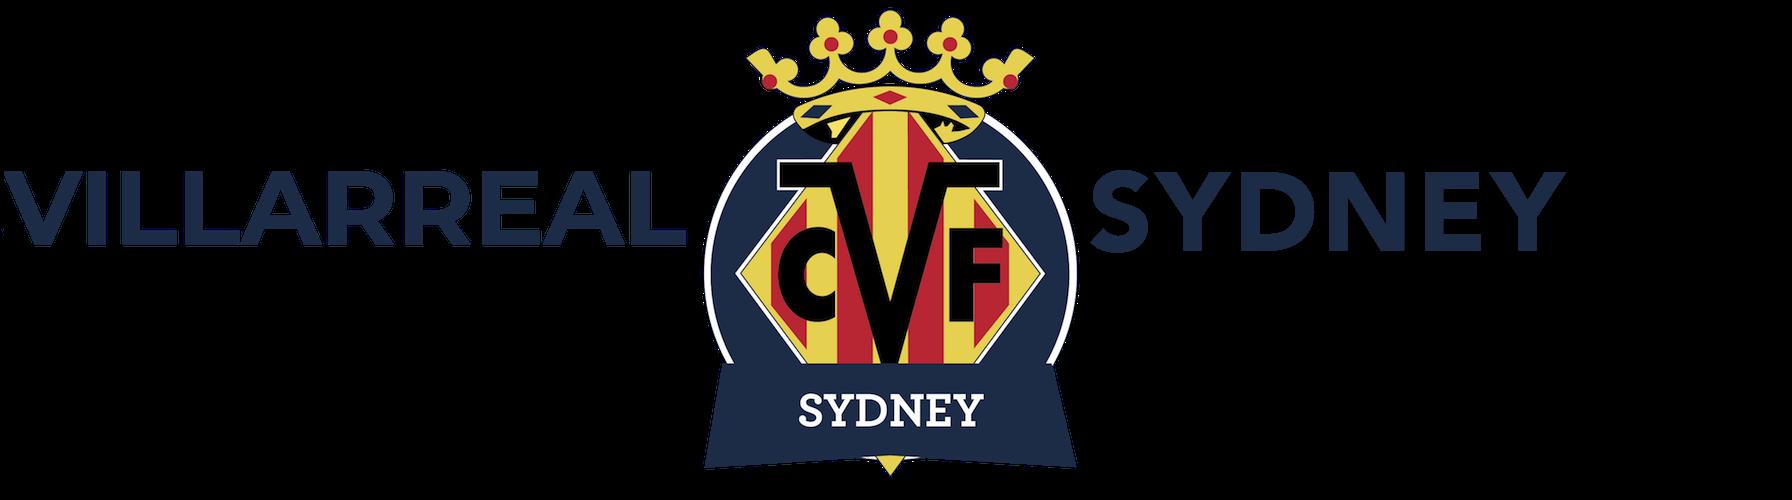 Villarreal Sydney Academy